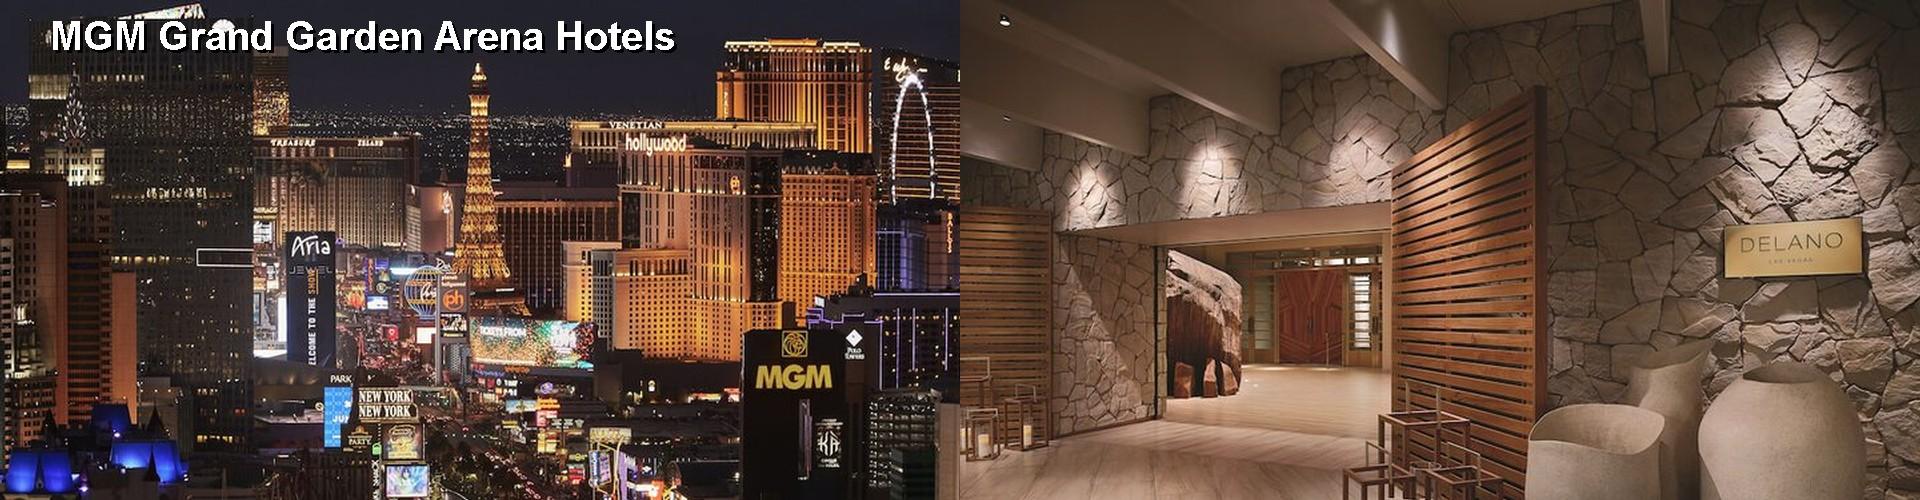 5 Best Hotels Near Mgm Grand Garden Arena